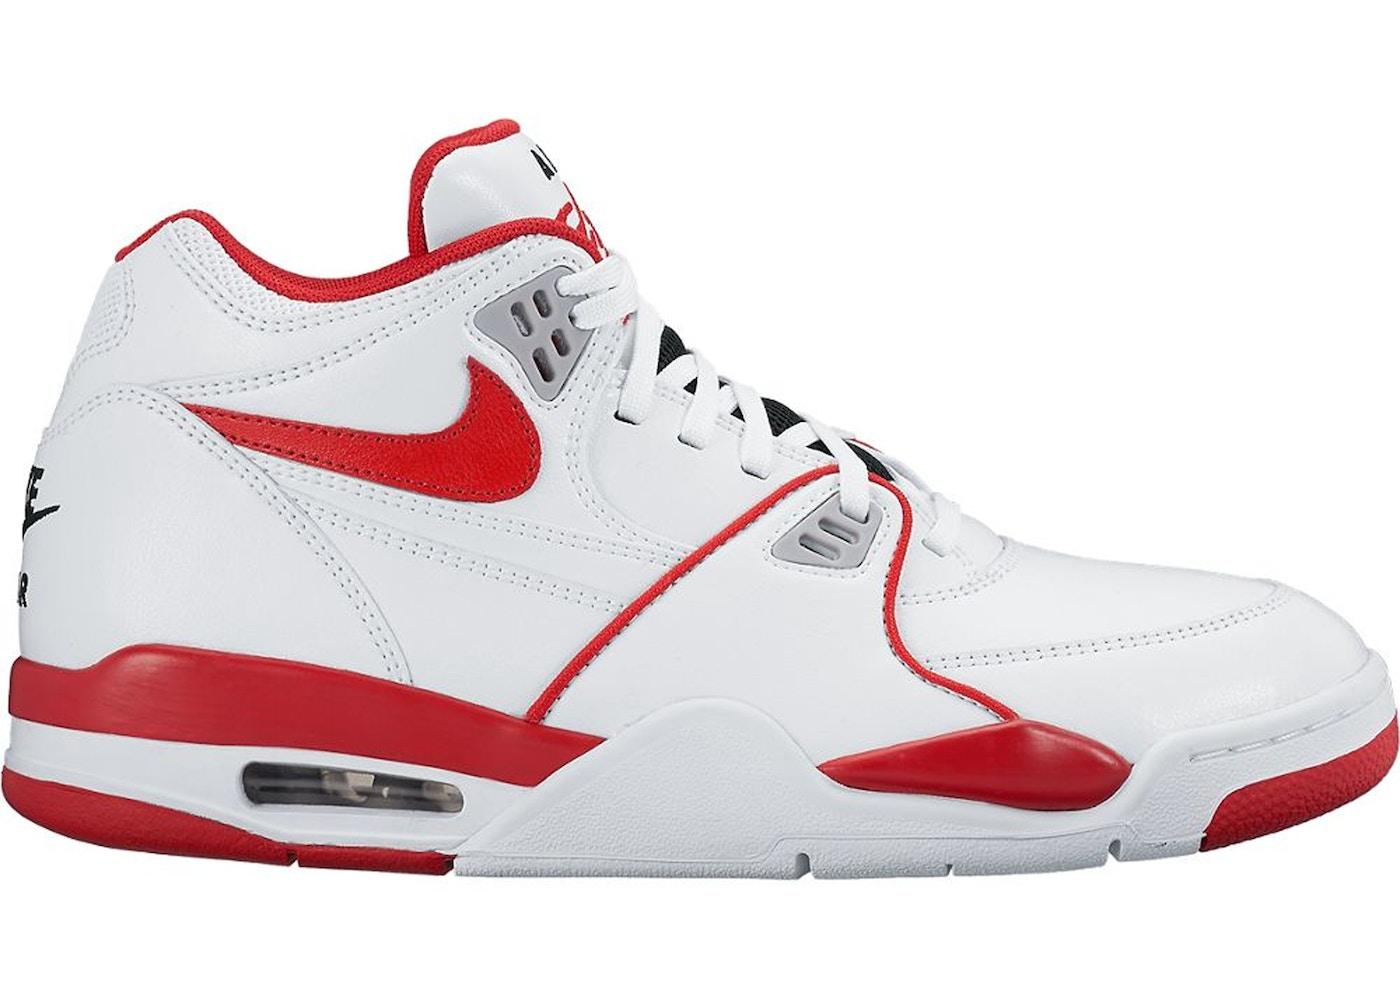 sono assonnato spessore barile  Nike Air Flight 89 White University Red - 819665-100